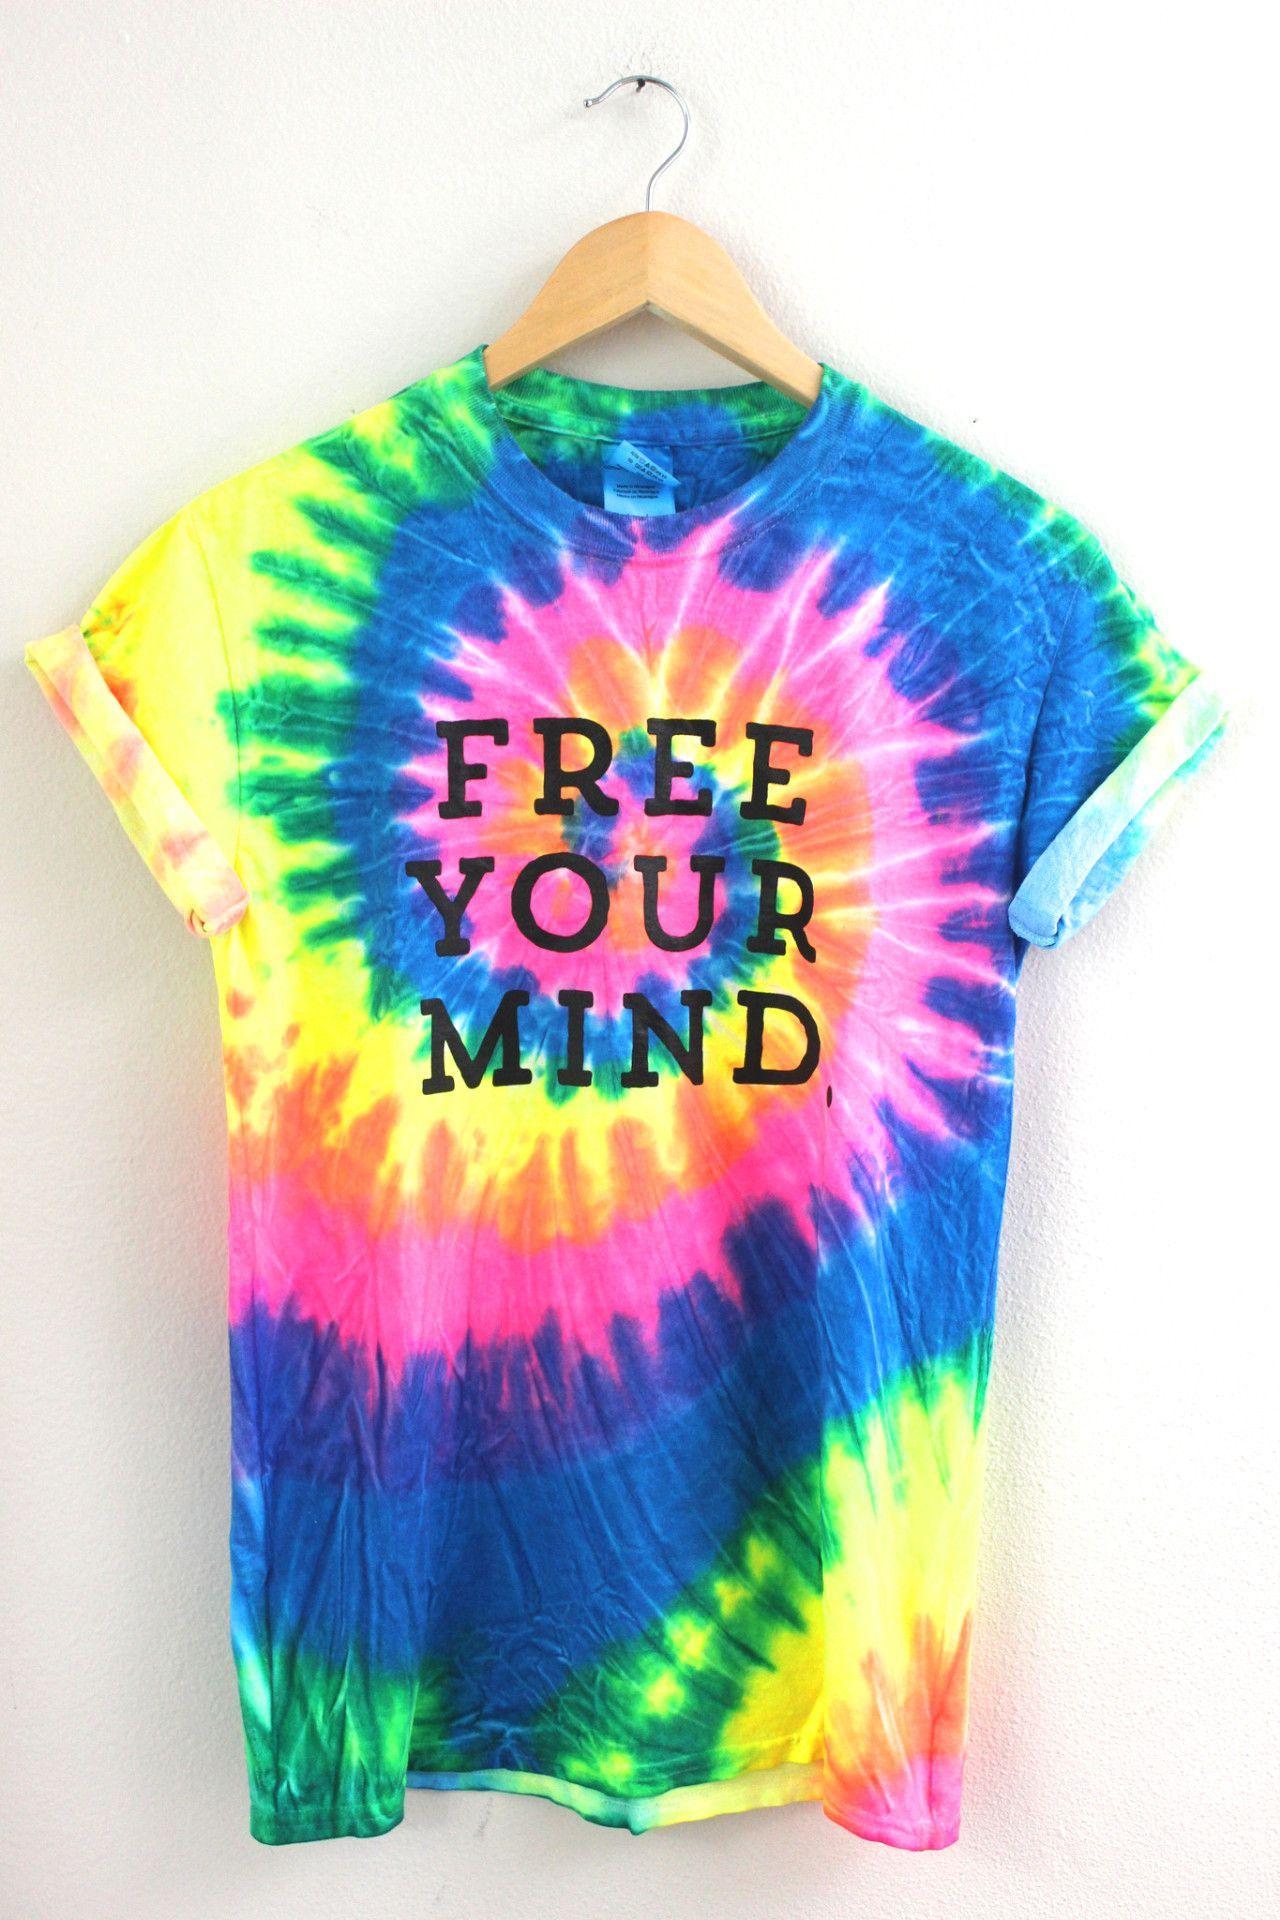 fdf0b813d1f Free Your Mind. Bright Rainbow Tie-Dye Graphic Unisex Tee